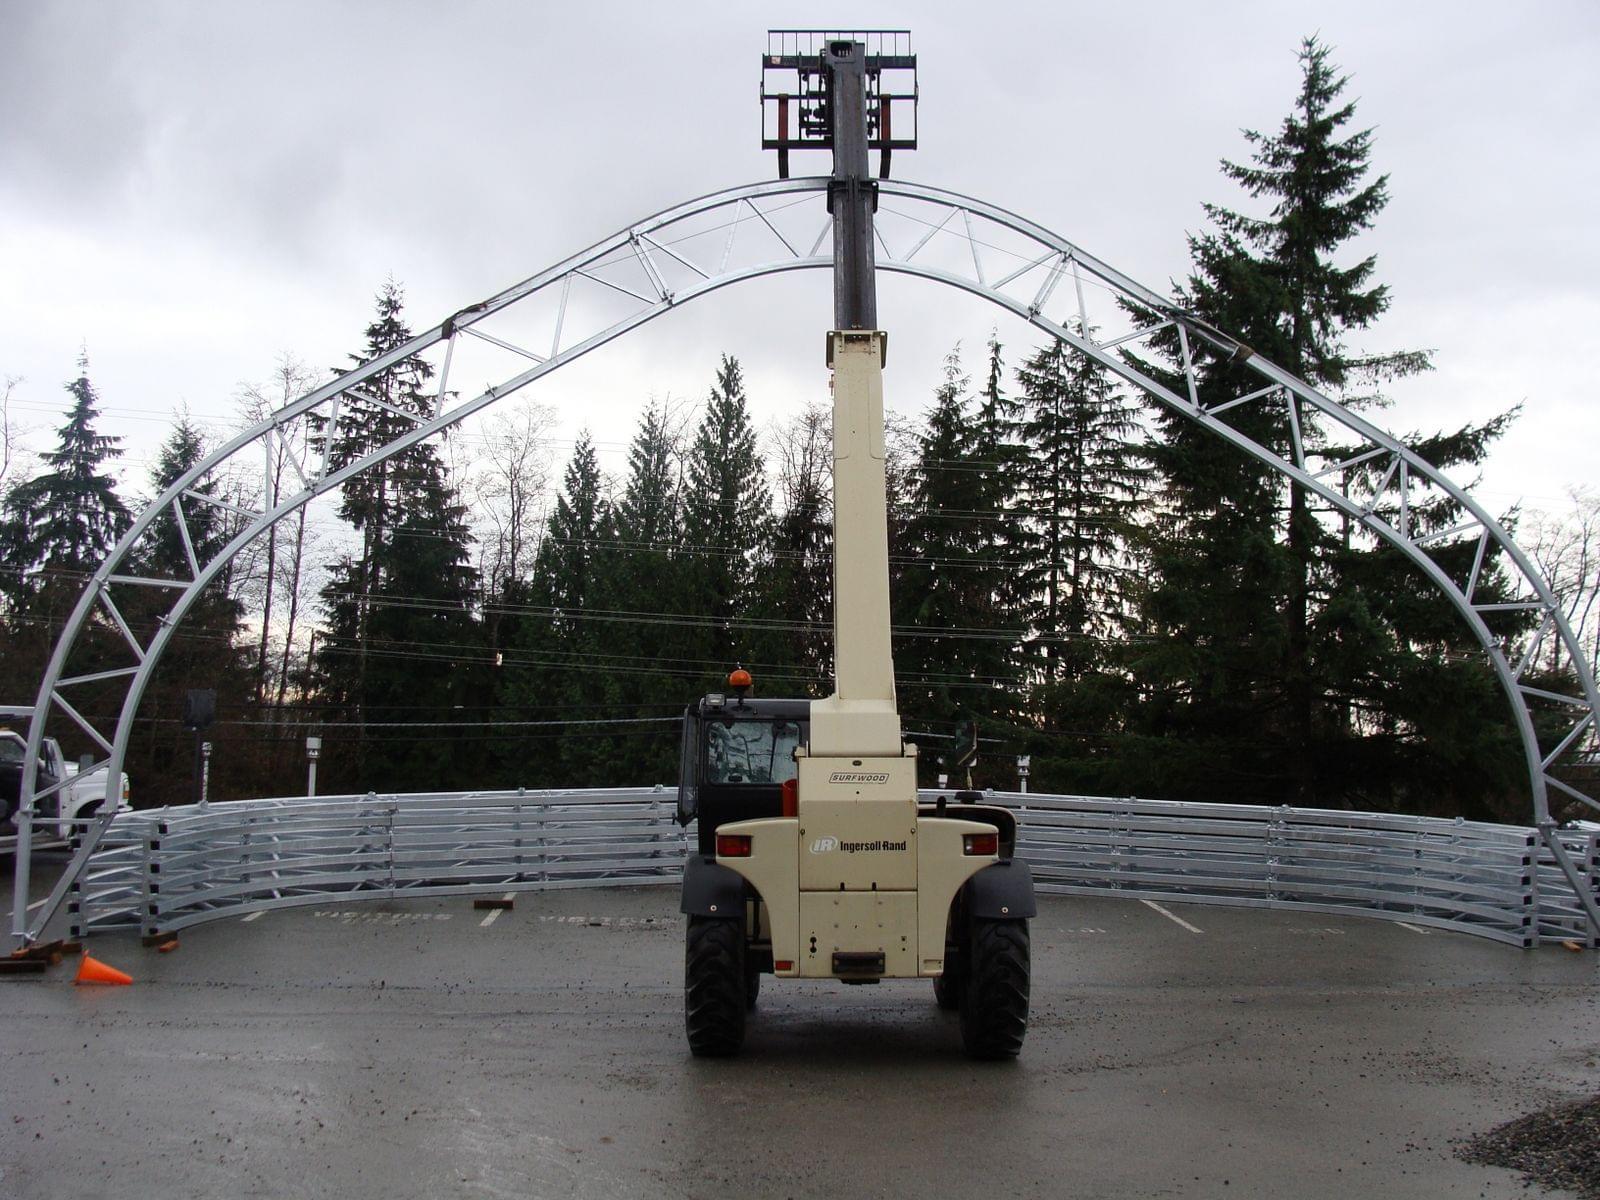 https://www.lantierstructures.com/wp-content/uploads/2019/08/DSC05270.jpg